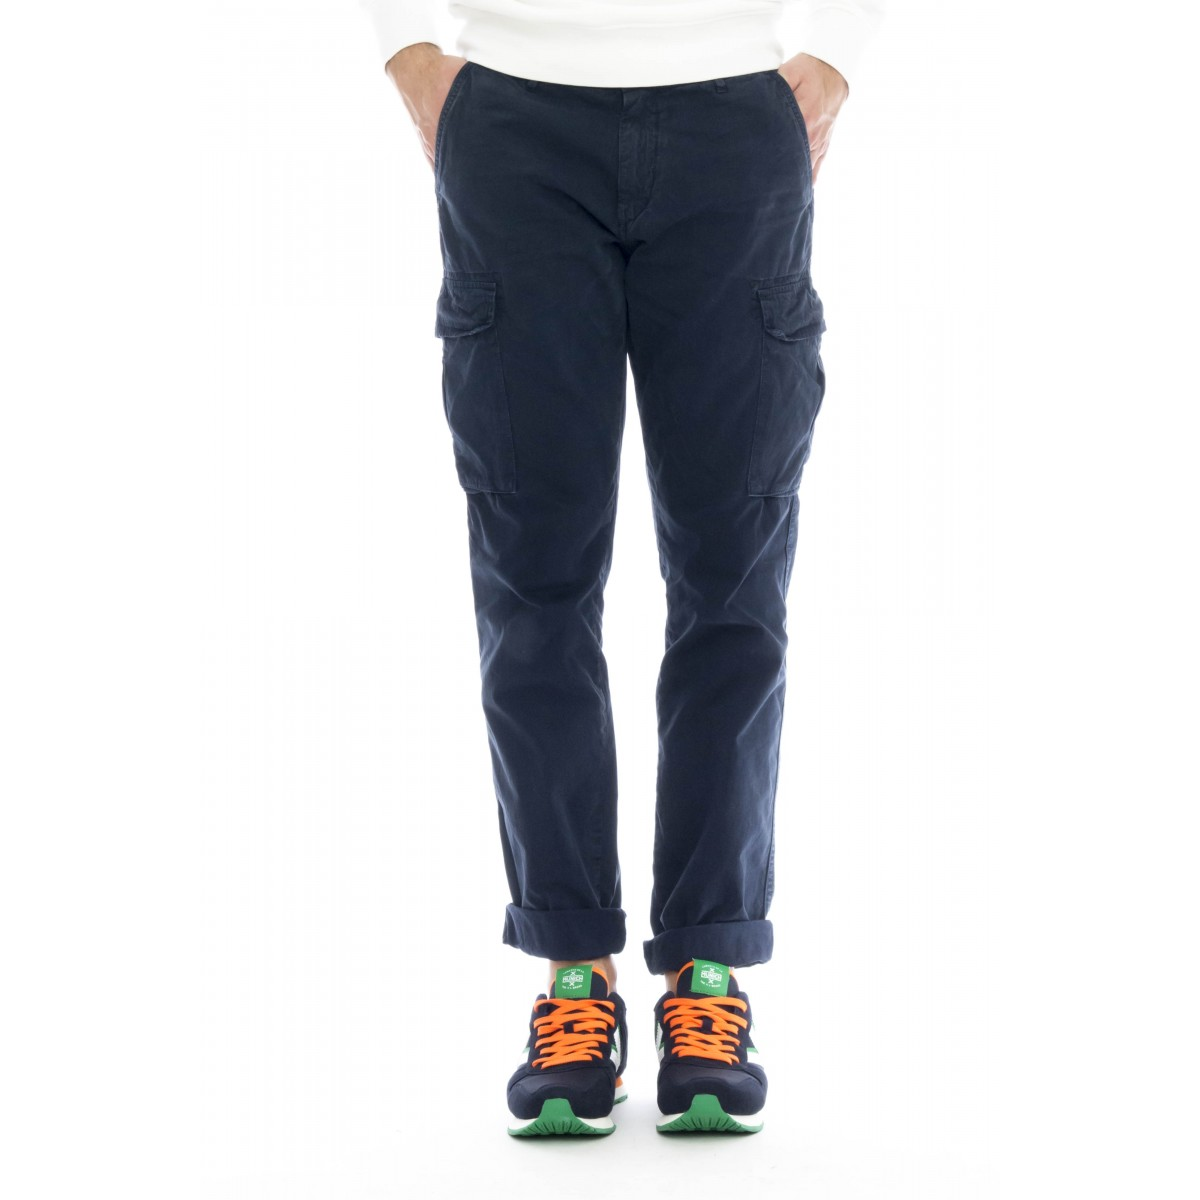 Pantalone uomo - Aiko 3745 tasconato